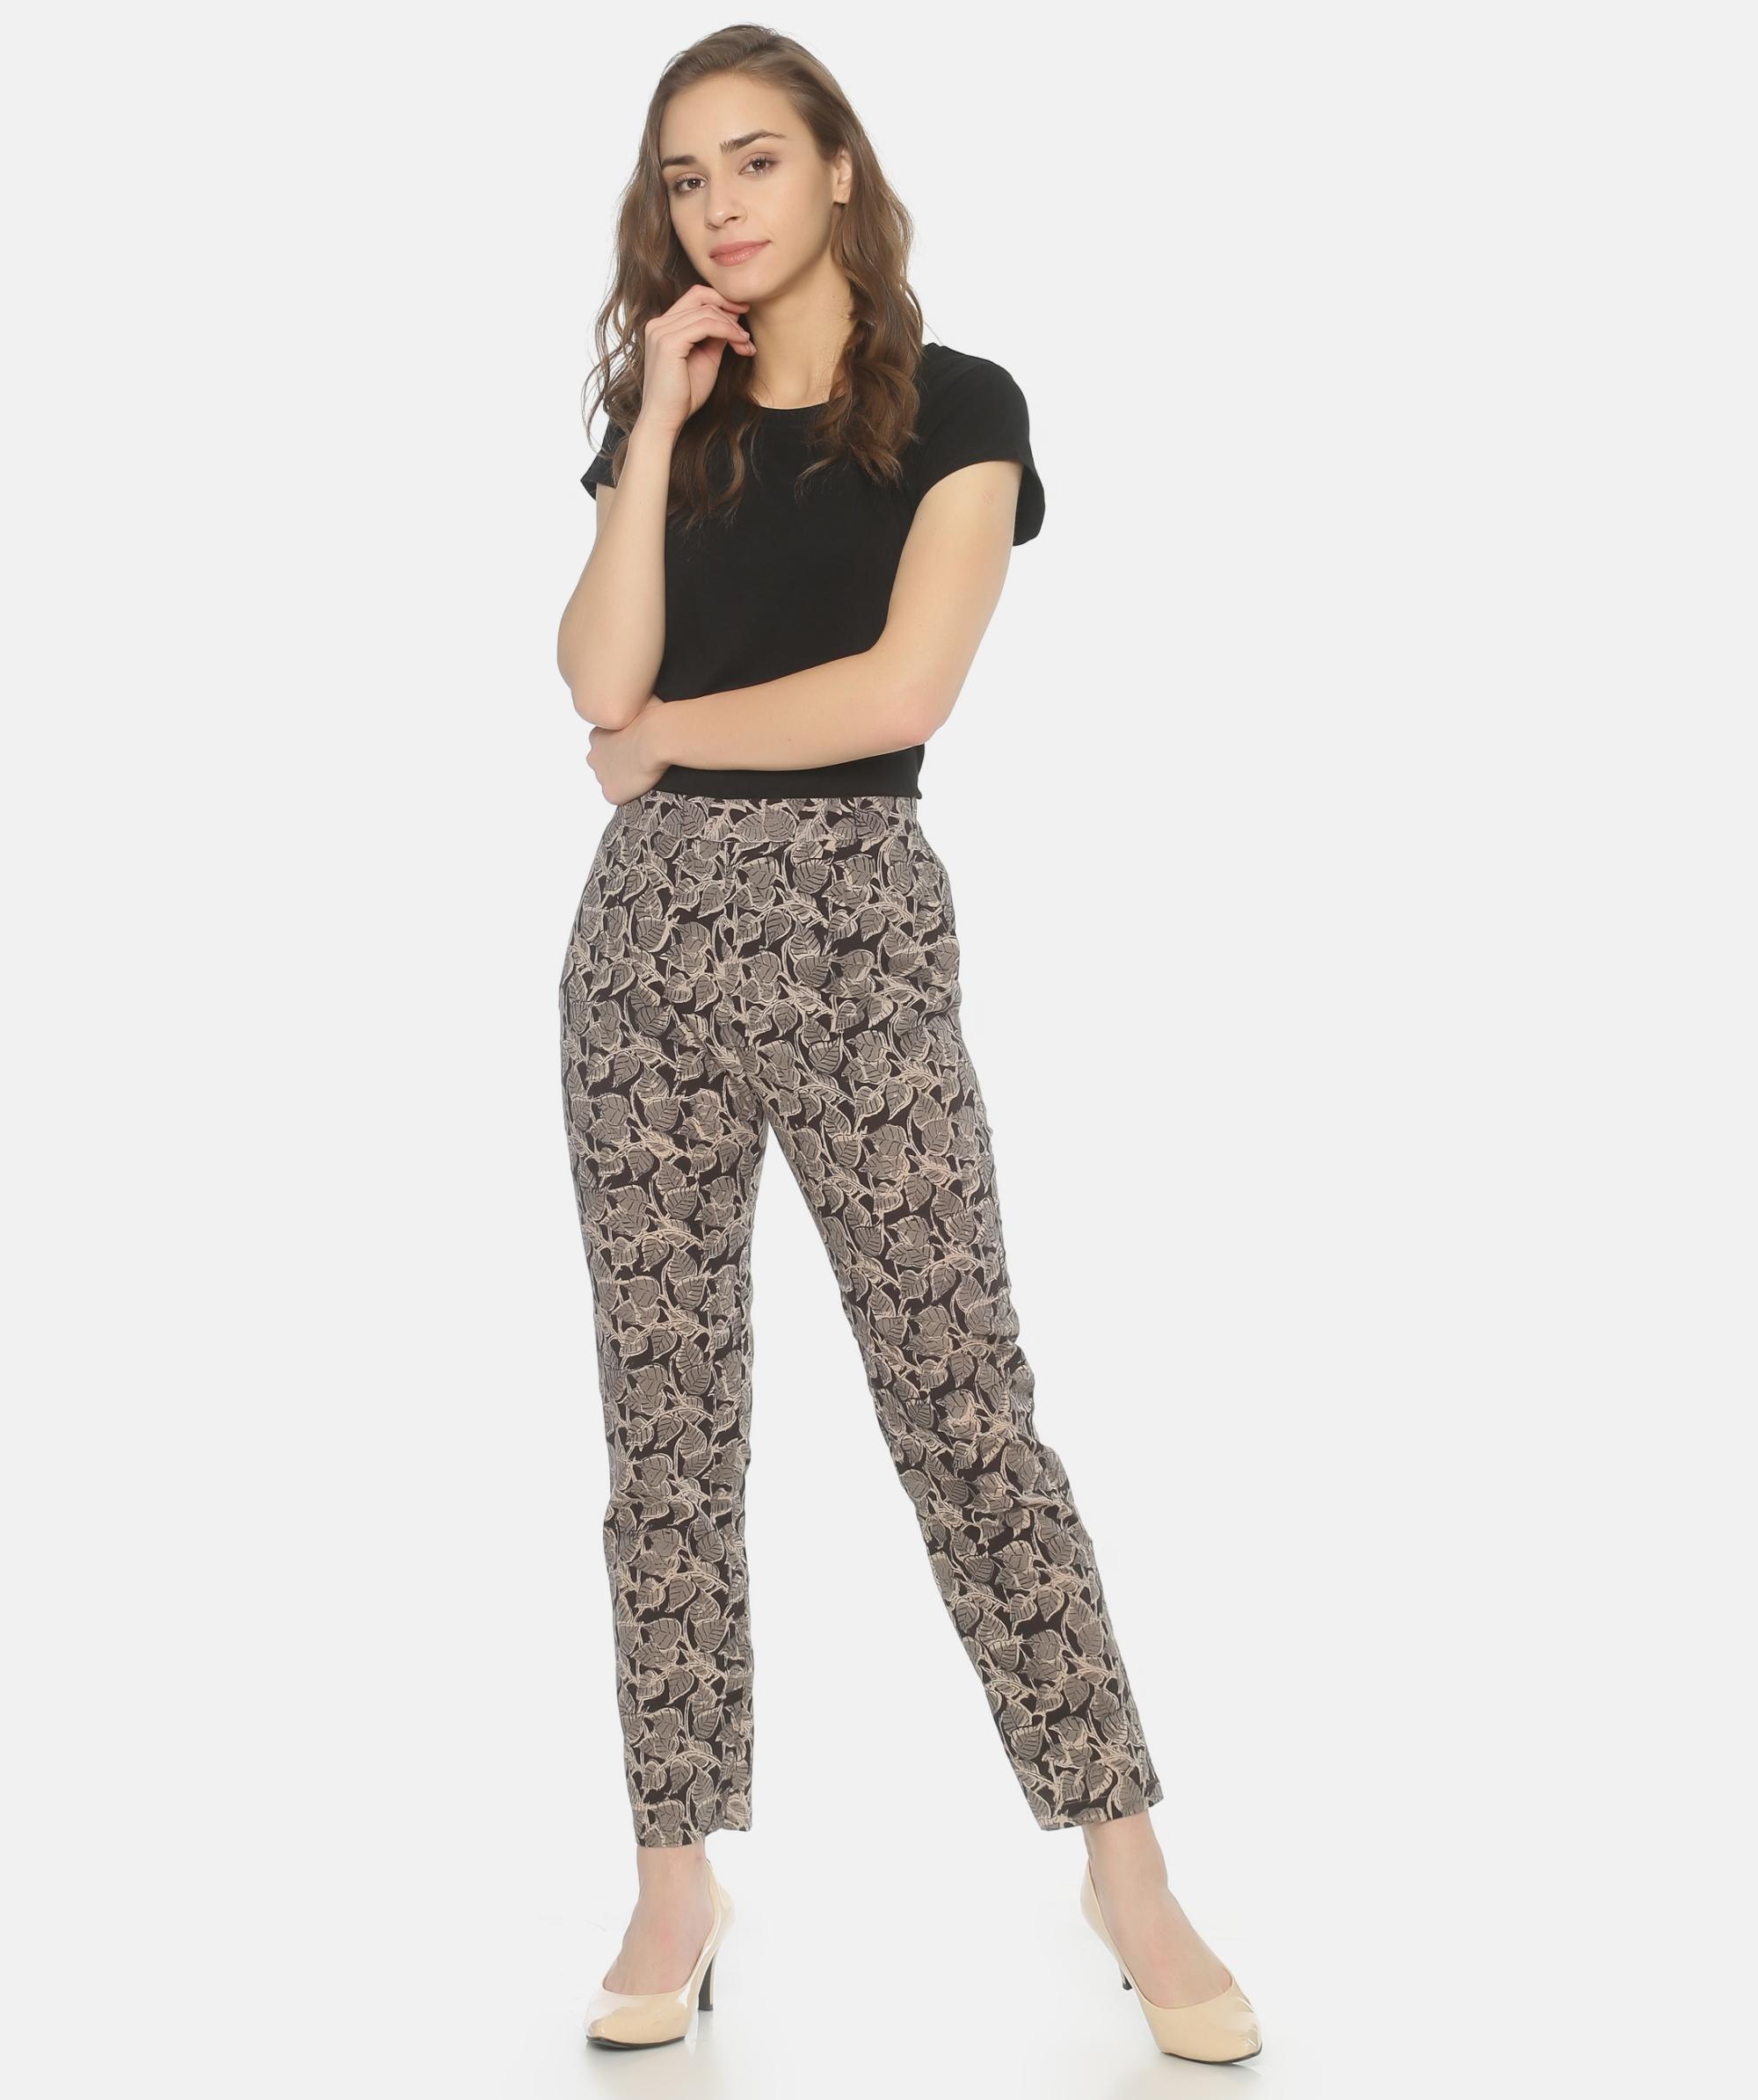 Black and grey kalamkari pants